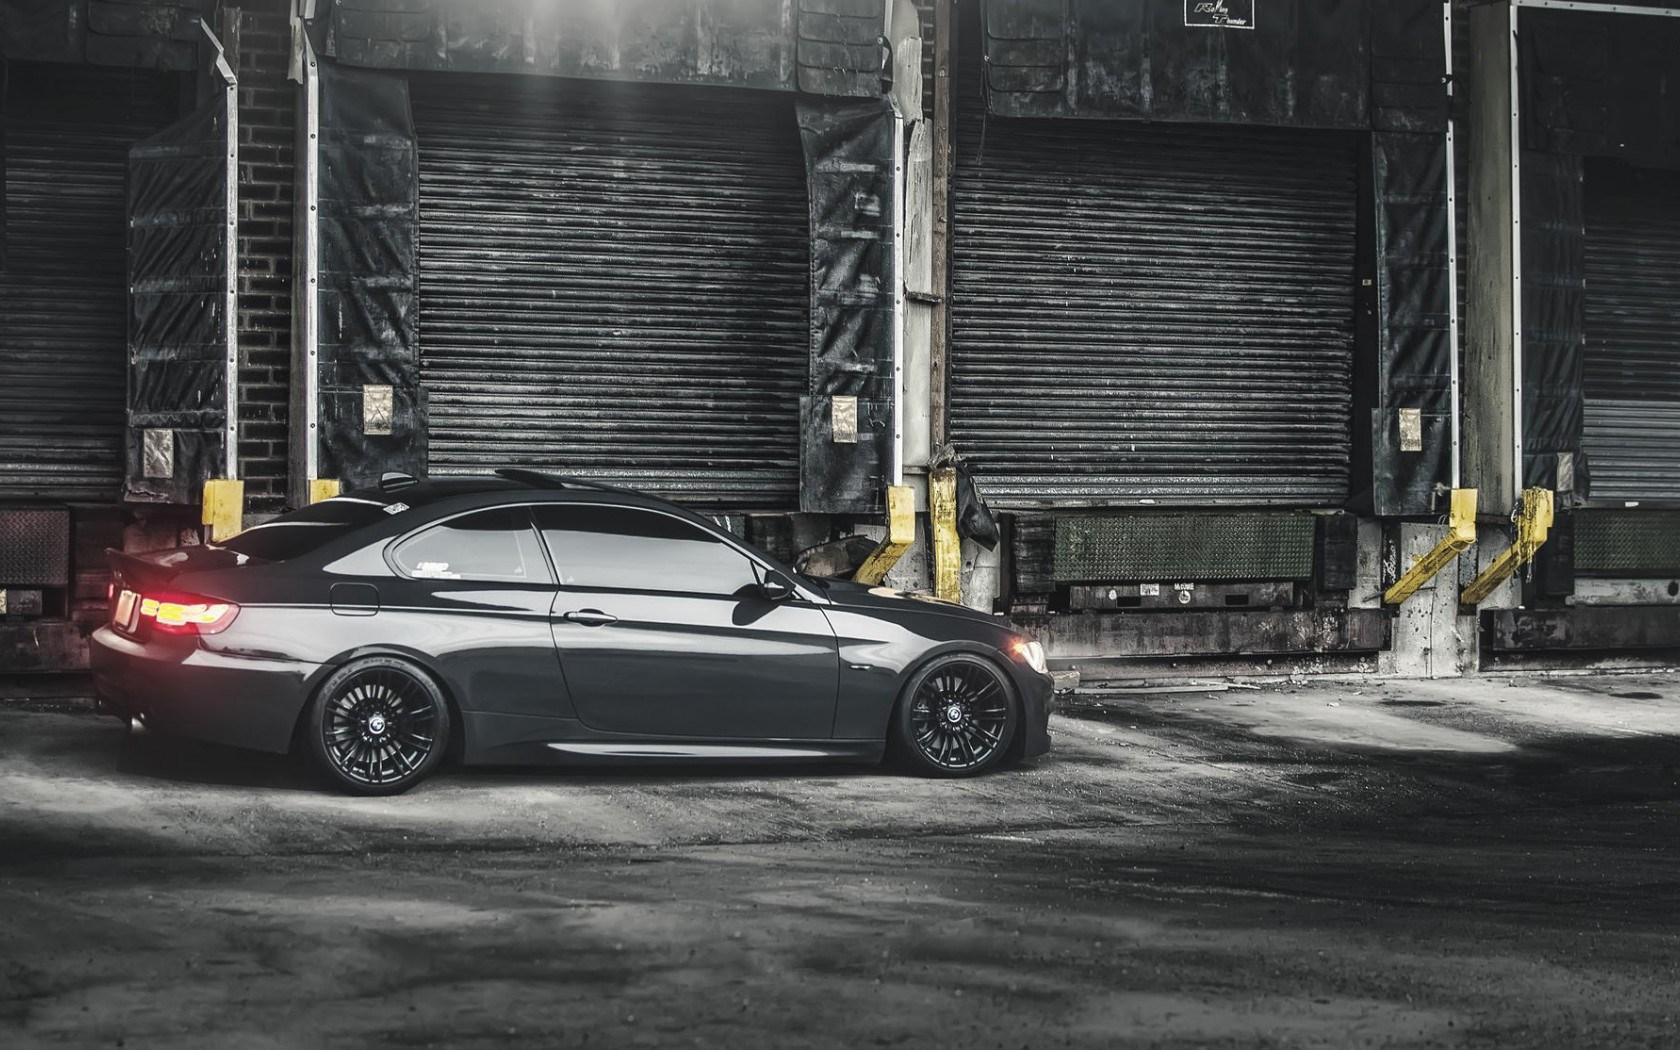 BMW E90 328i Car Side